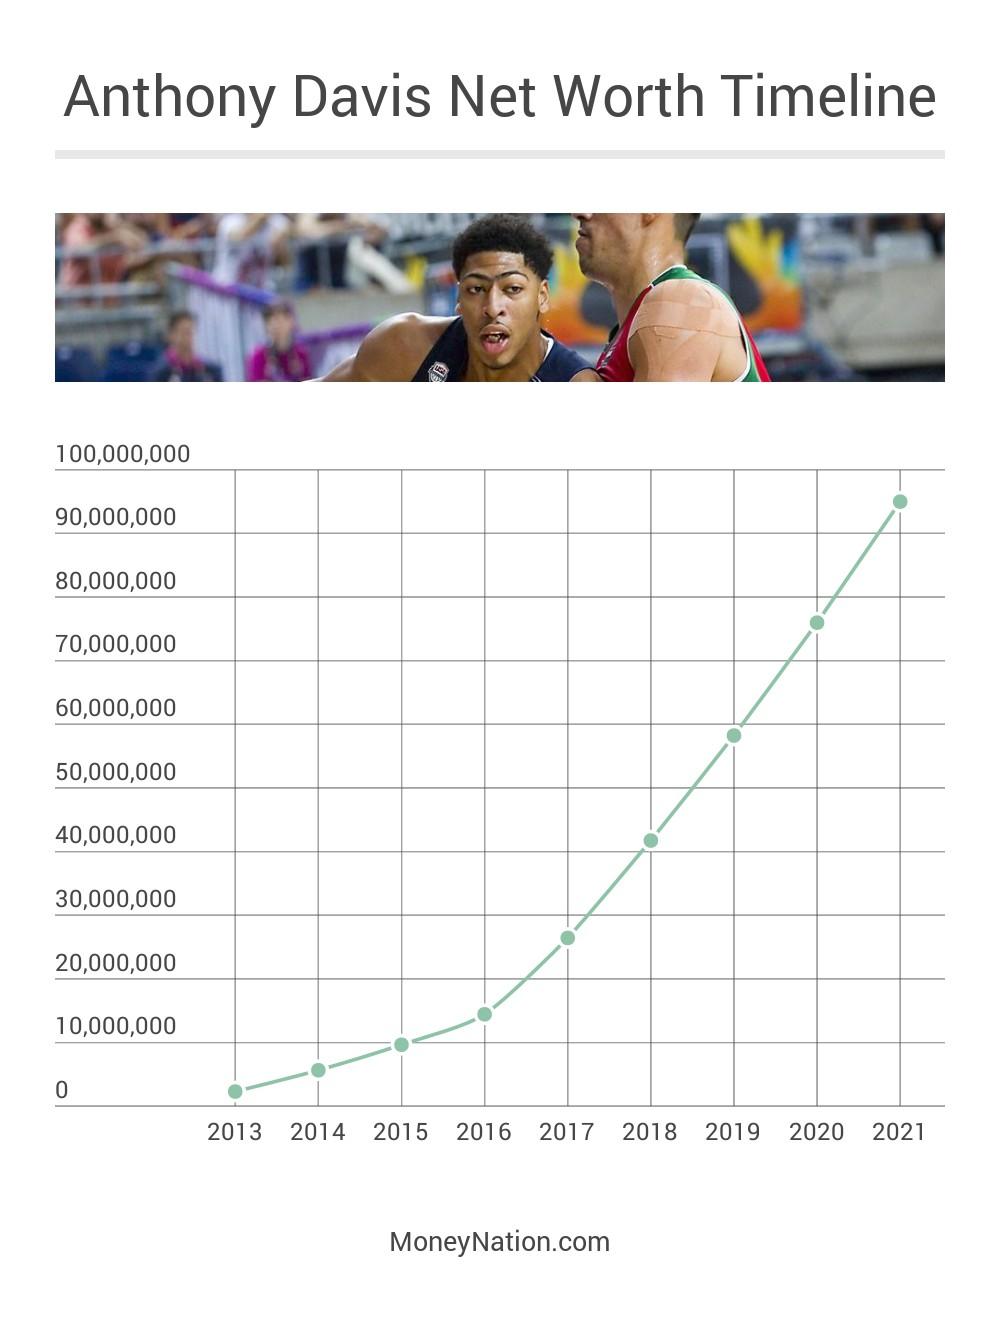 Anthony Davis Net Worth Timeline